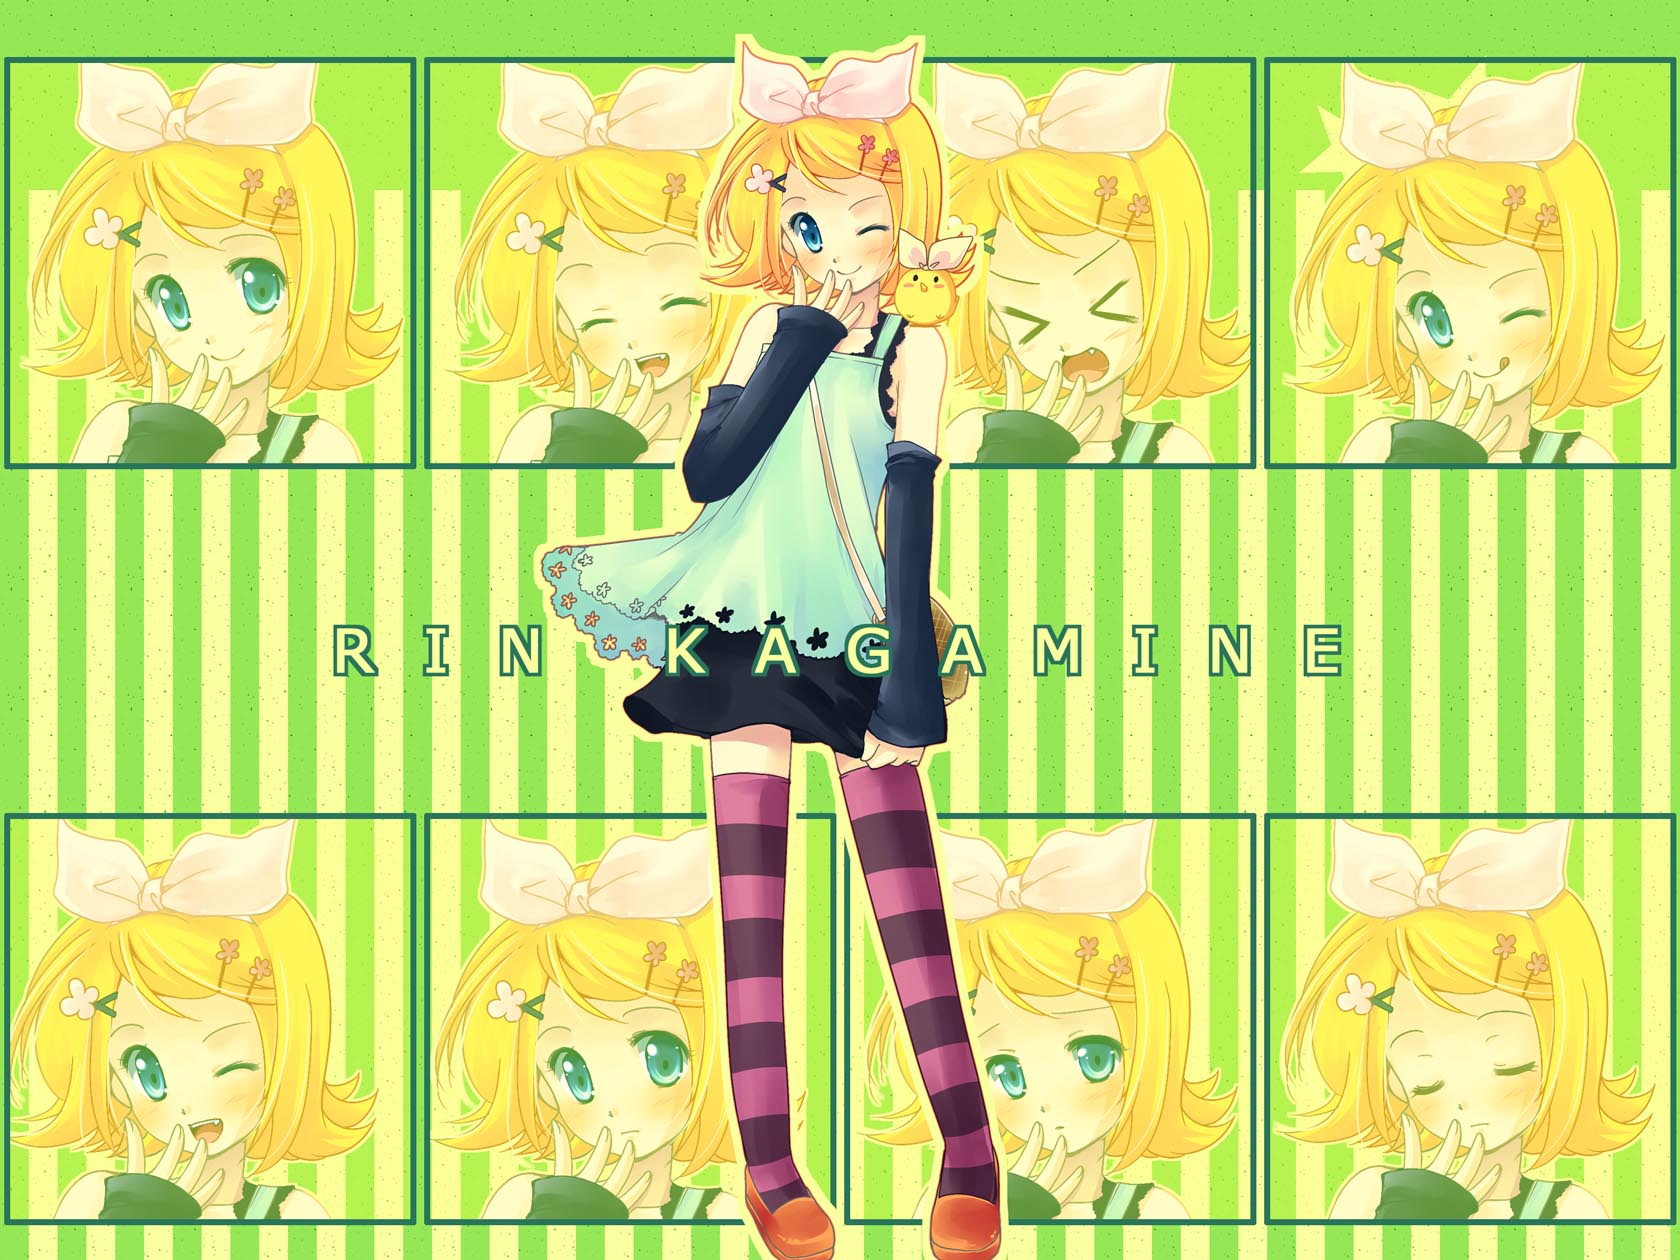 blonde_hair blue_eyes blush fang kagamine_rin ribbons short_hair skirt thighhighs vocaloid wink